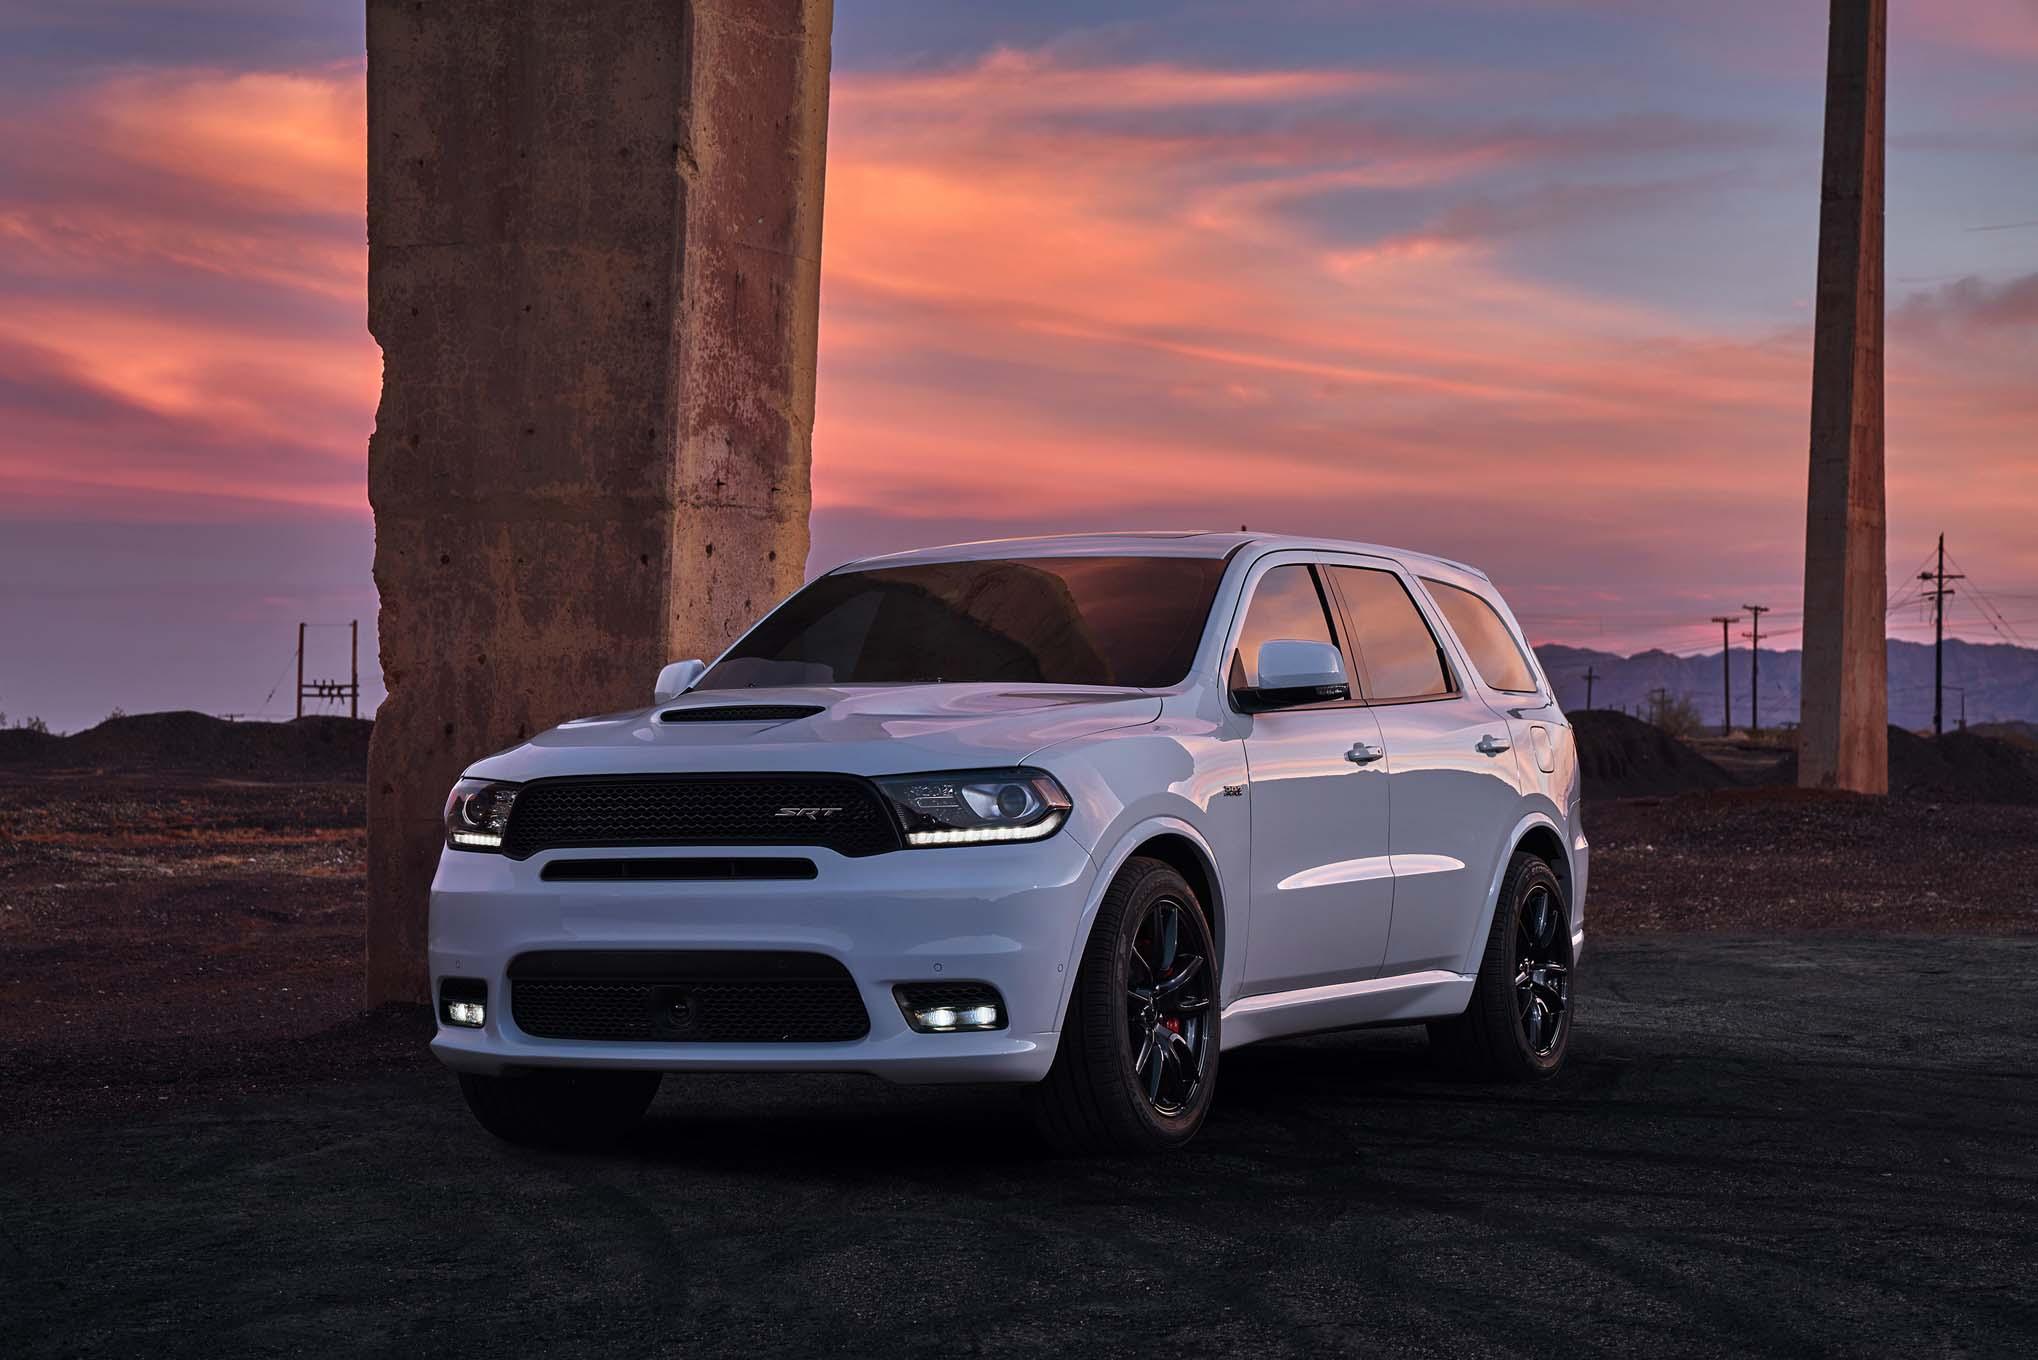 2018 Dodge Durango SRT First Look